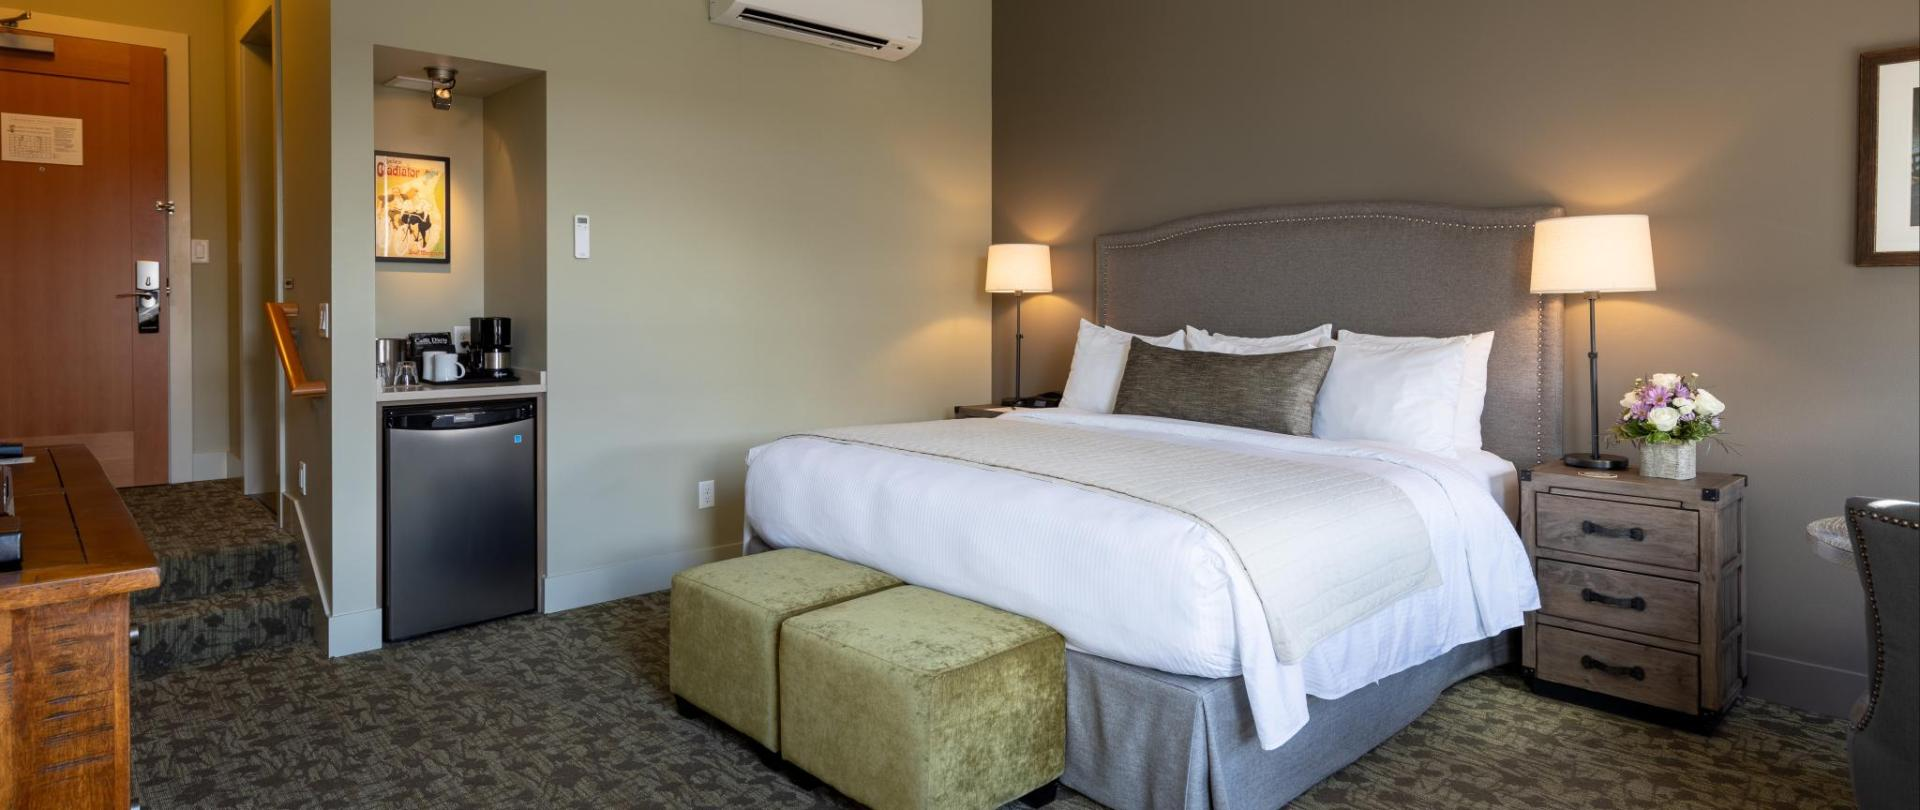 20190423 Room 22 1.jpg